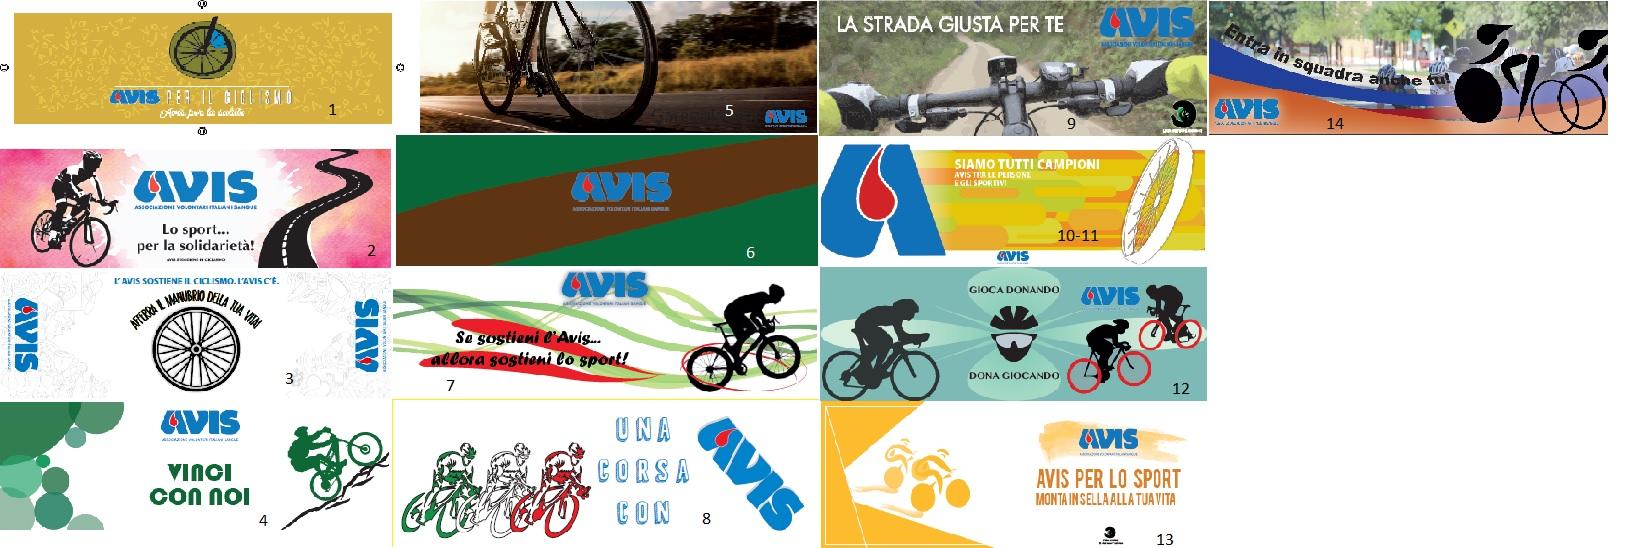 Ciclismo (7)